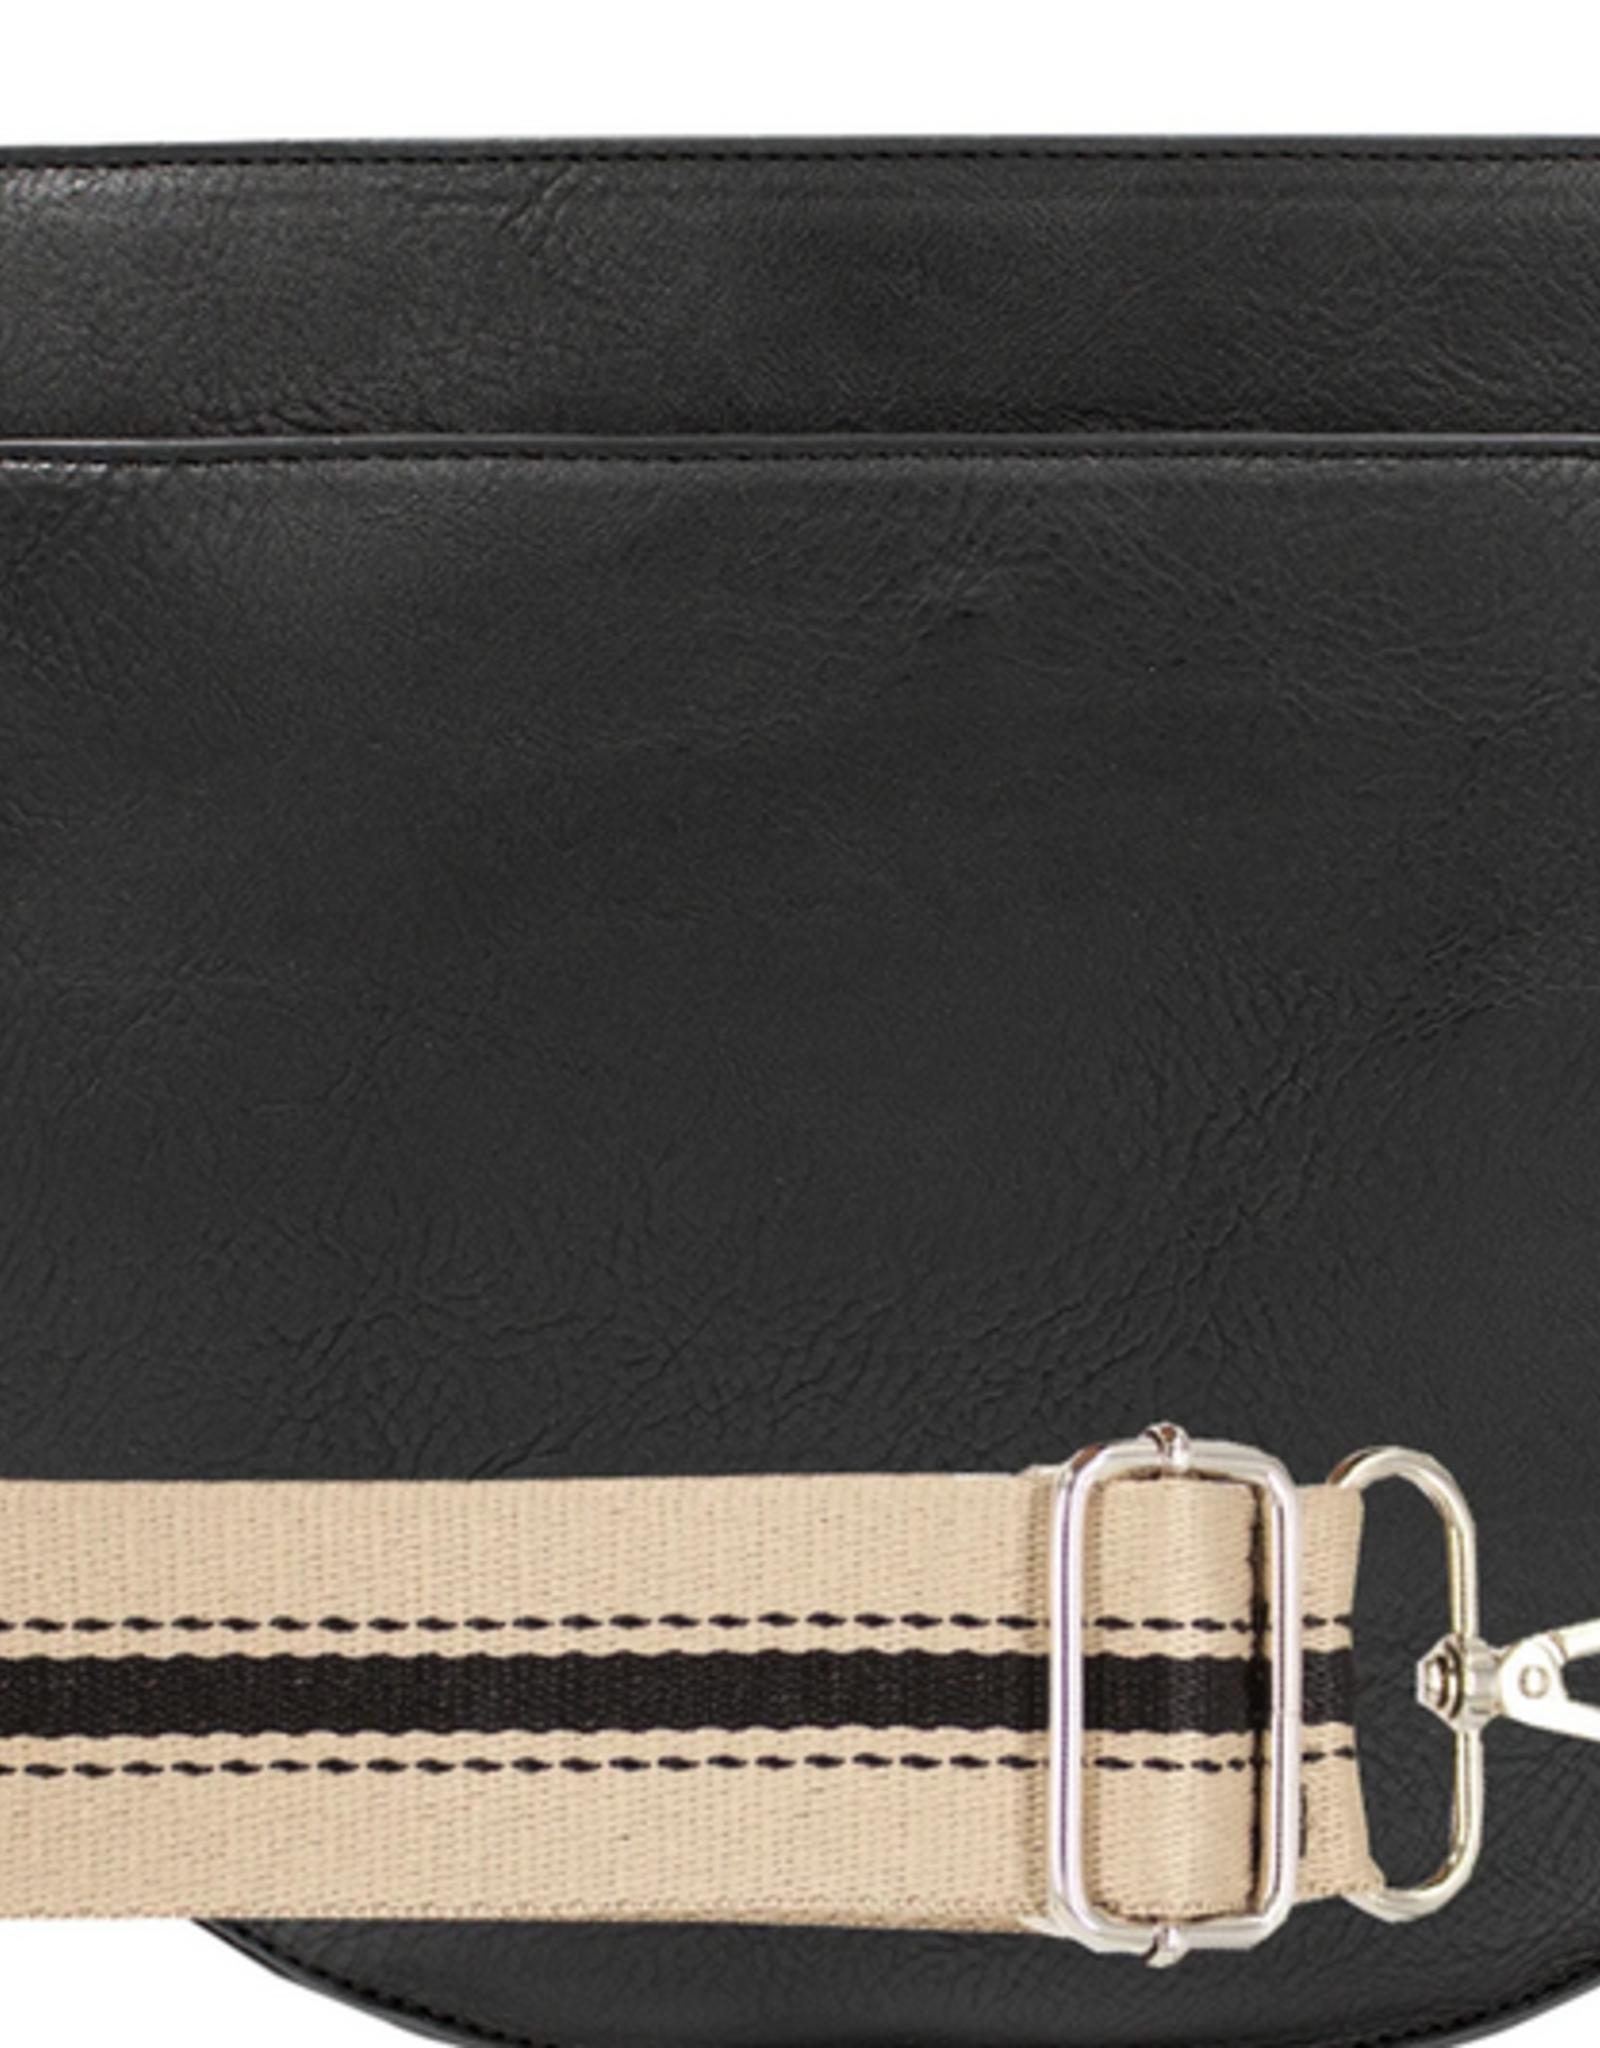 K Carroll Saddle Bag